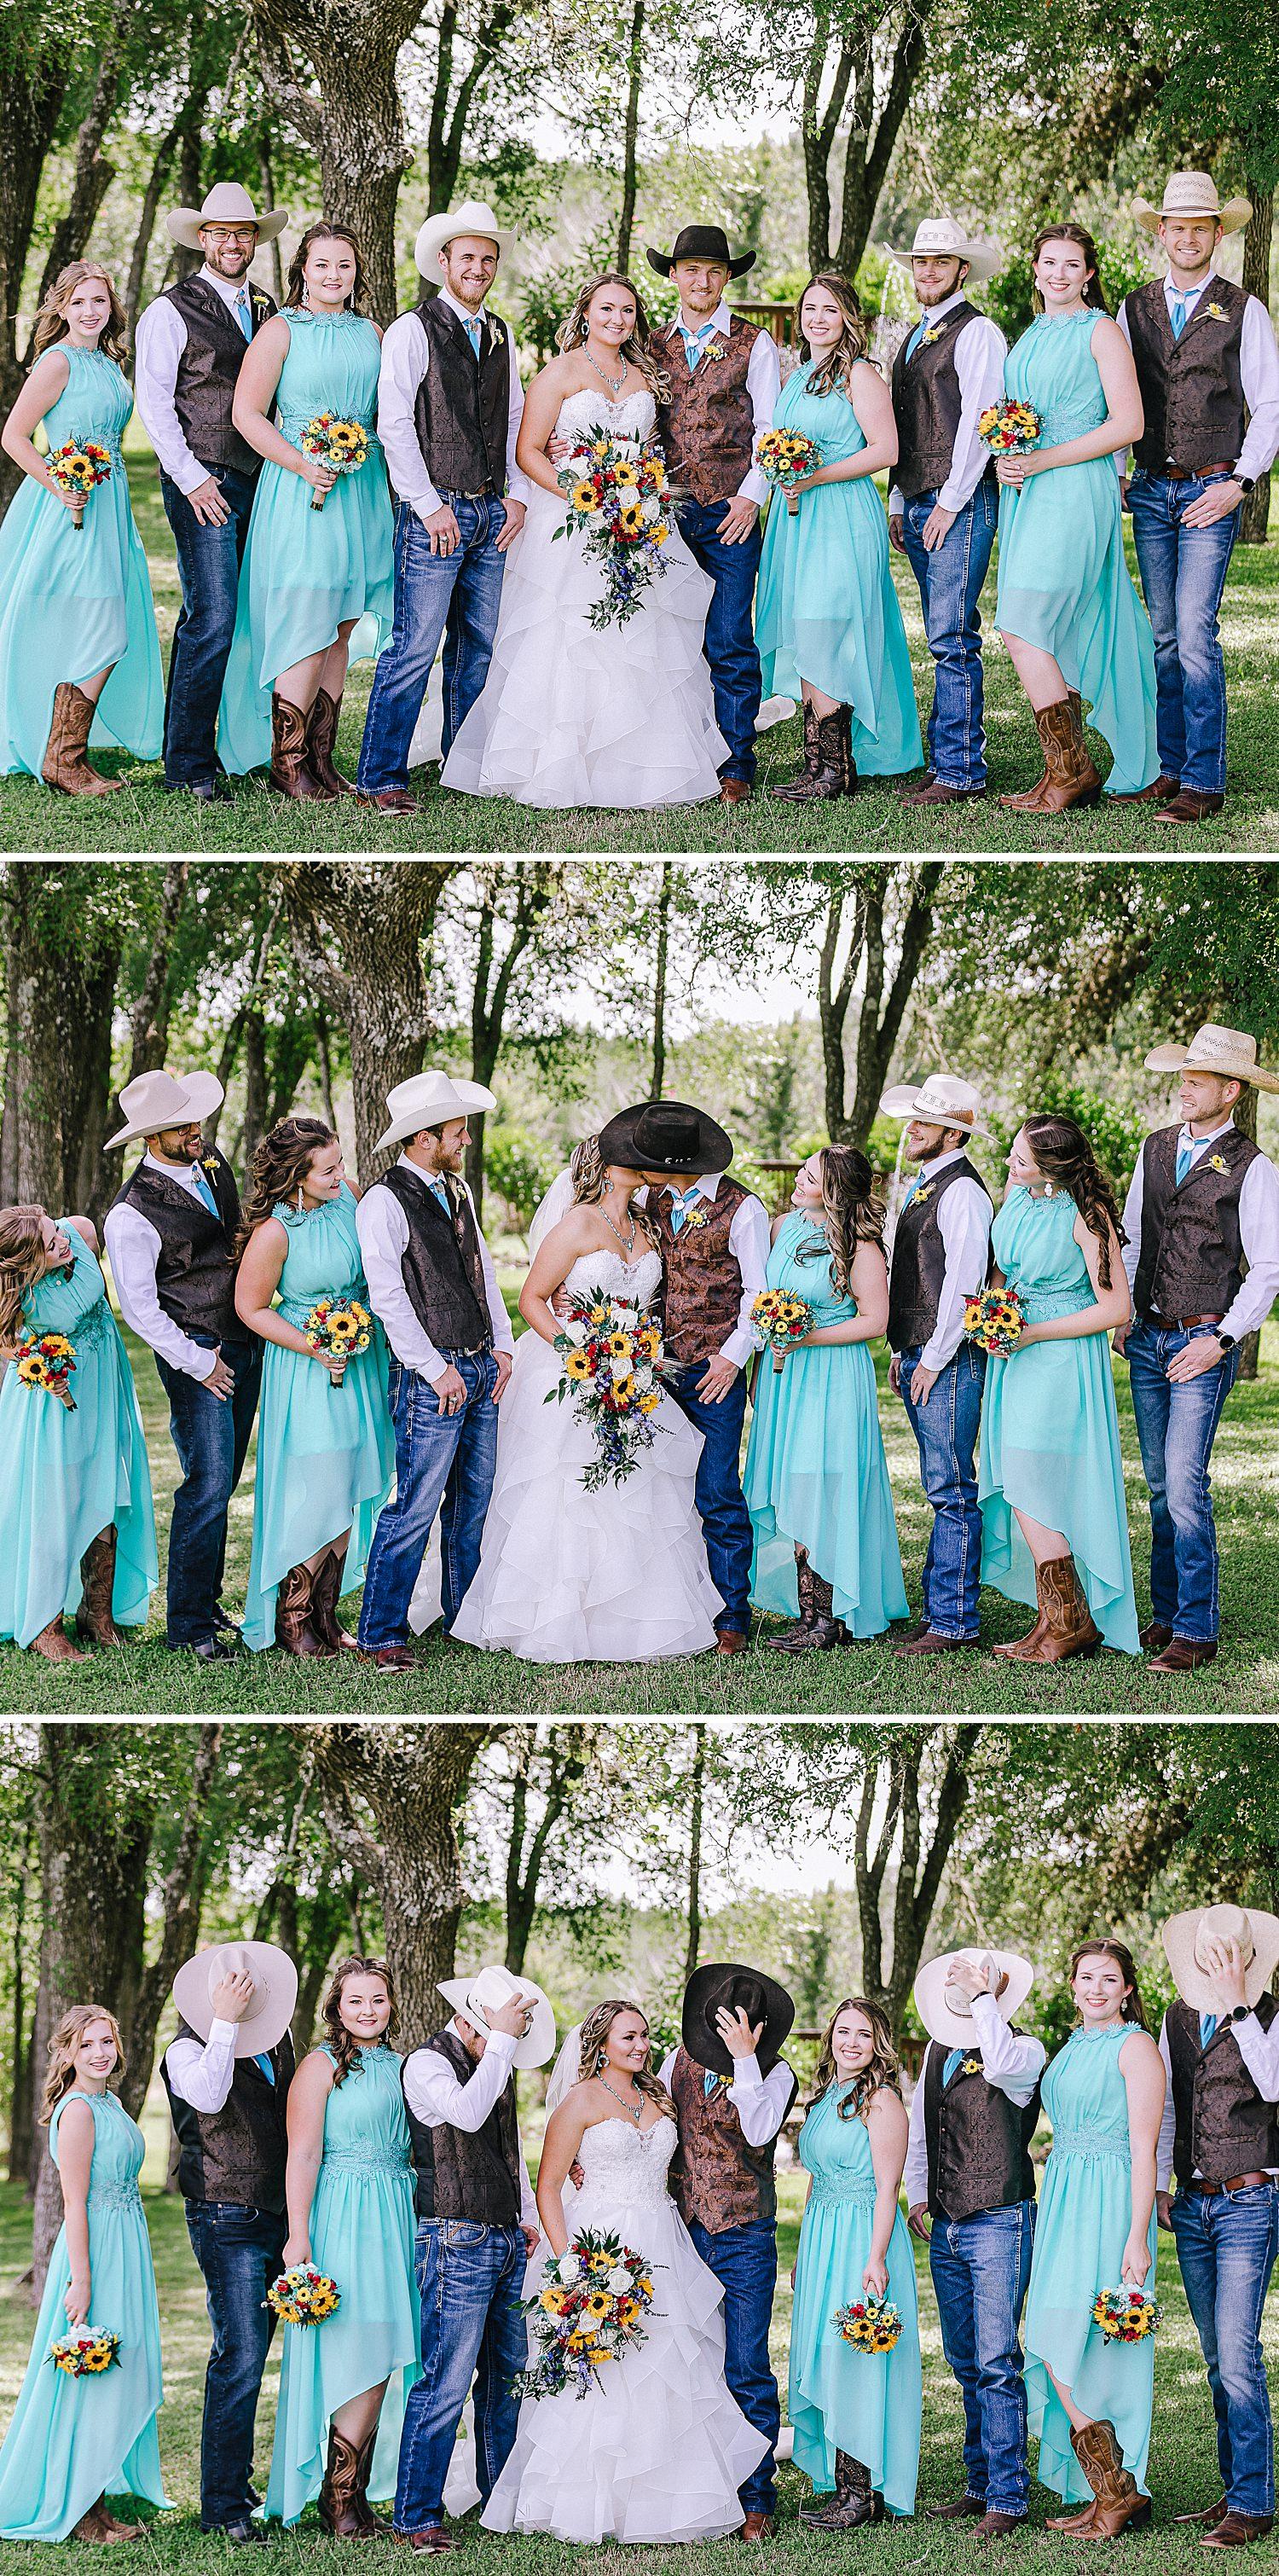 Carly-Barton-Photography-Old-Town-Texas-Rustic-Wedding-Photos-Sunflowers-Boots-Kyle-Texas_0052.jpg